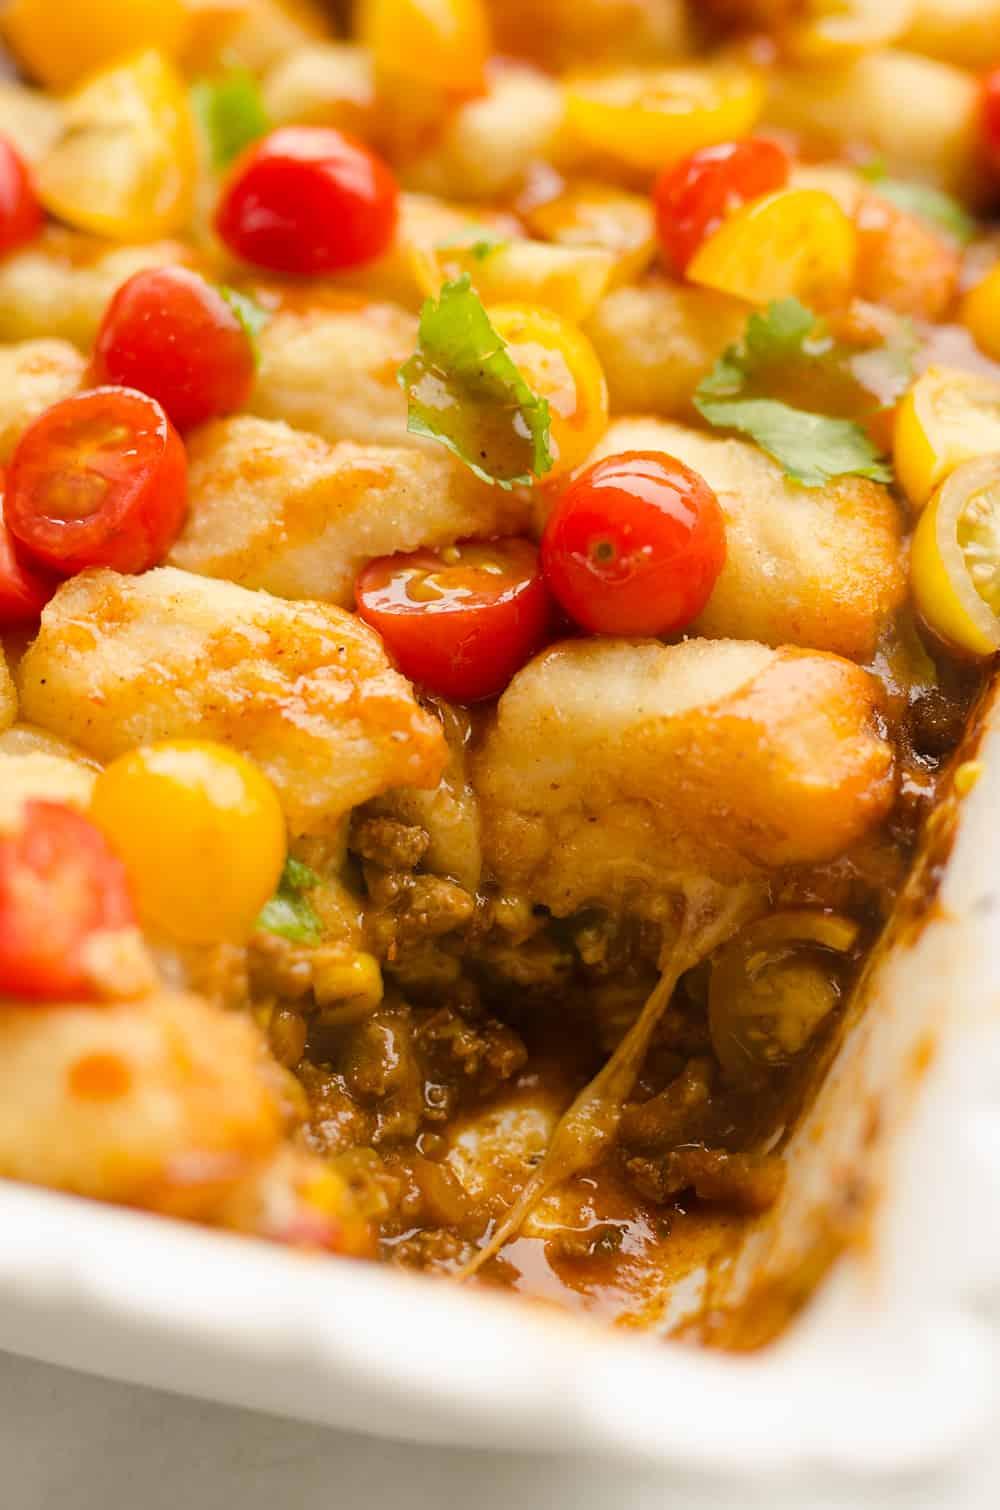 Light Taco Cauliflower Tot Hotdish casserole